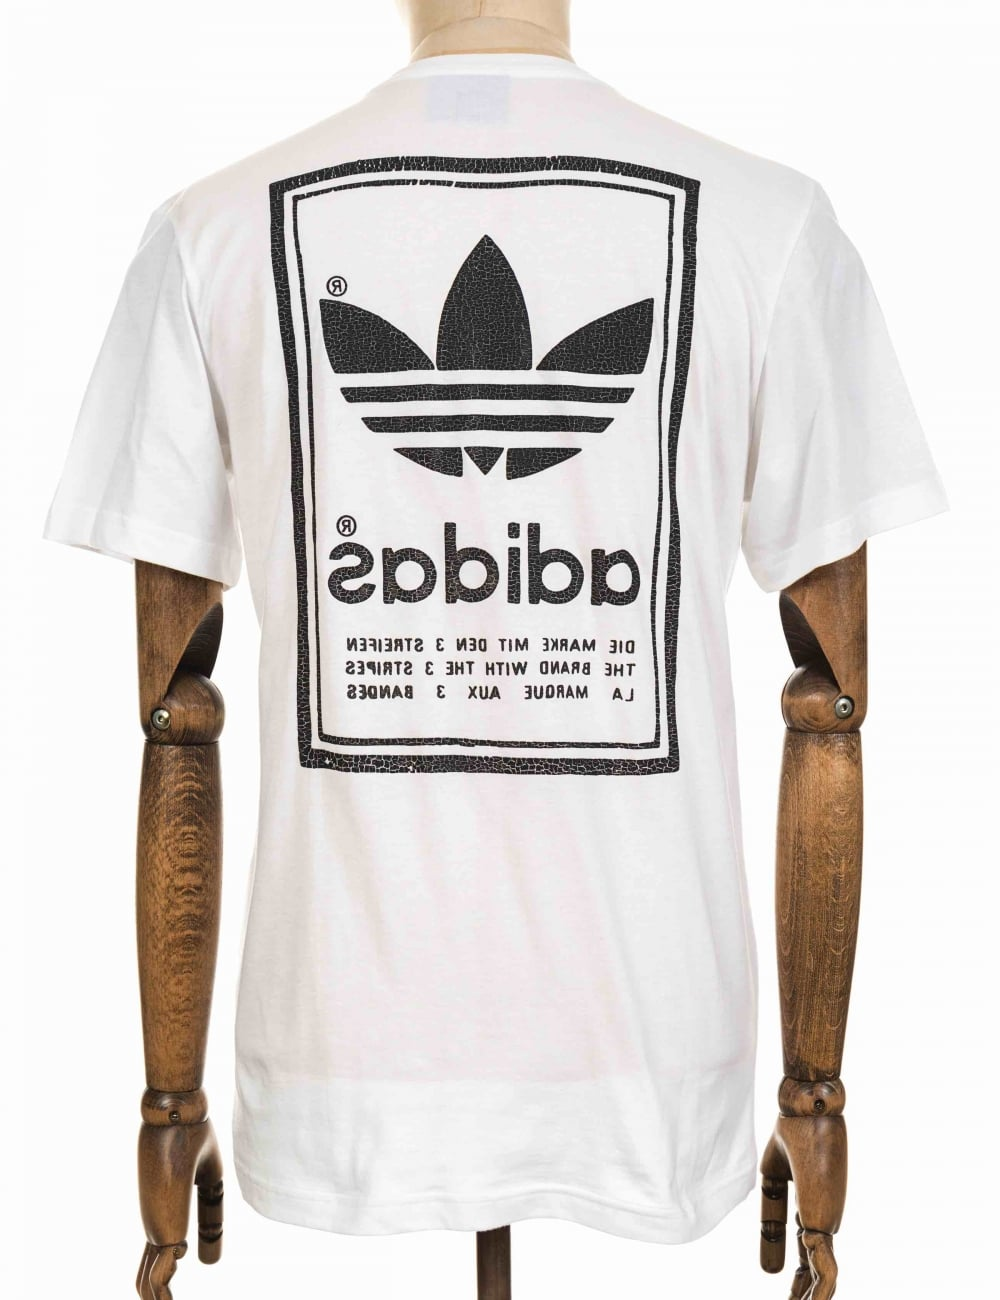 adidas shirt with japanese writing